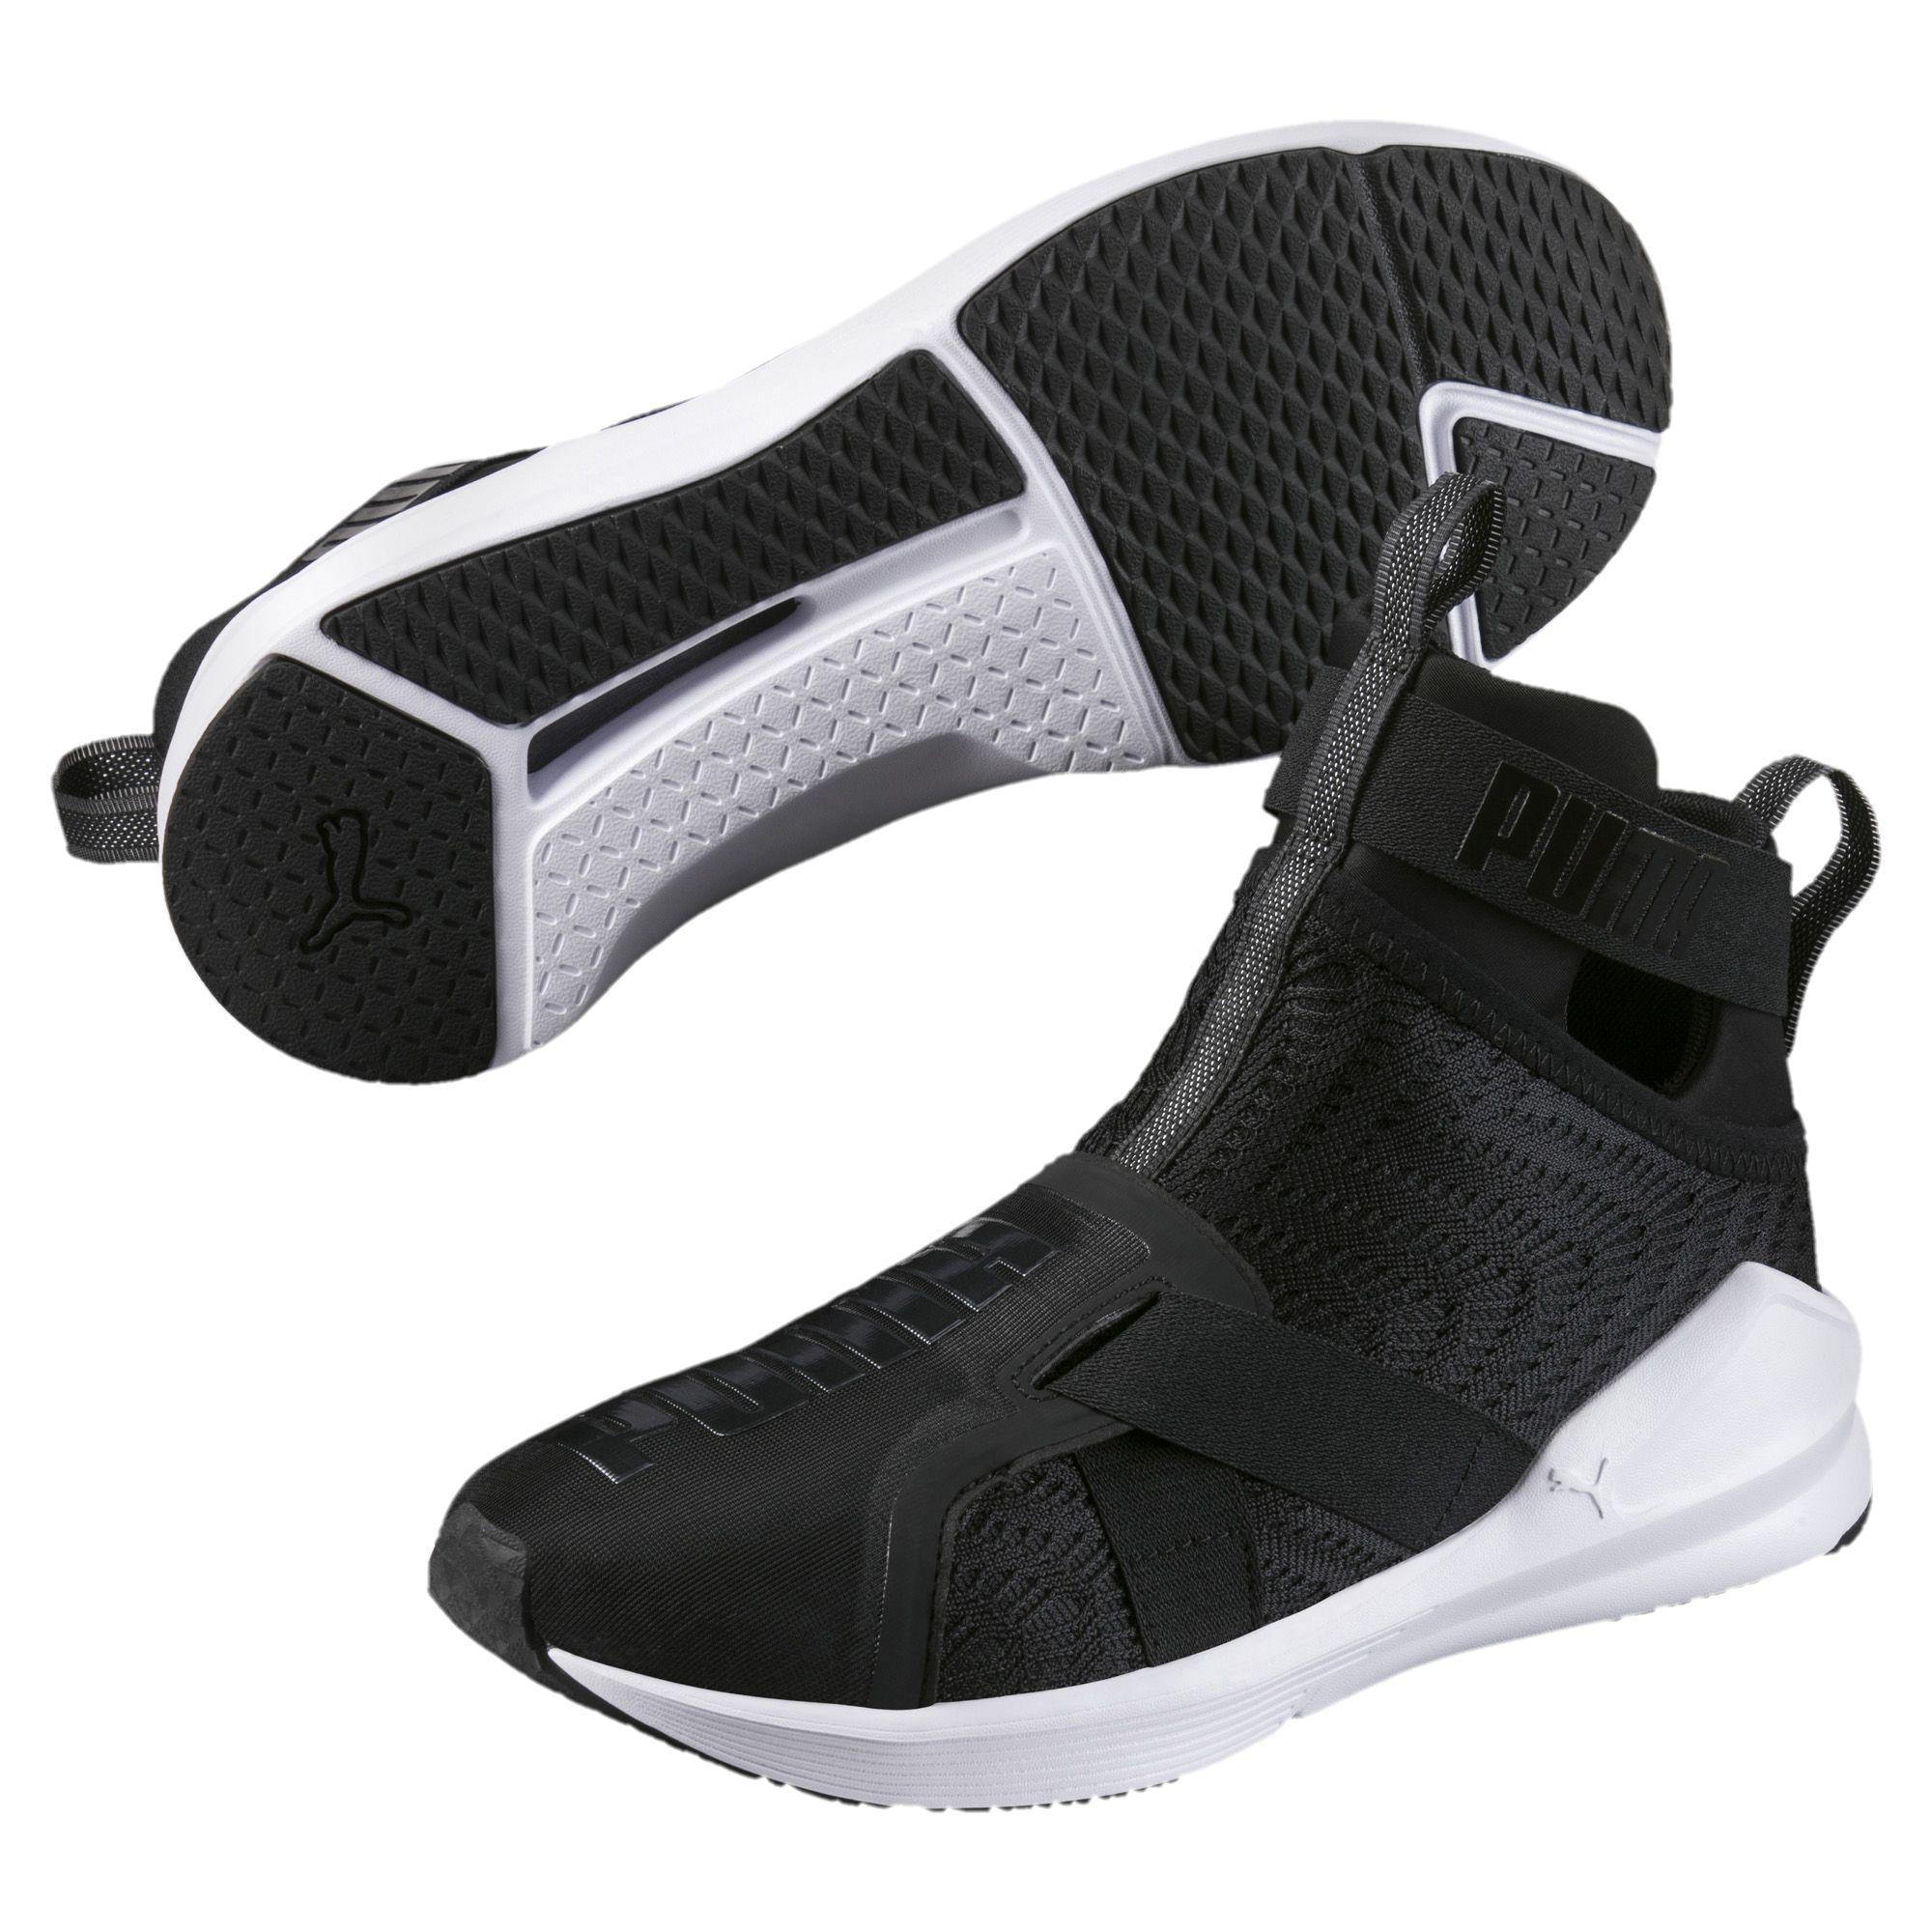 check out c53b9 8d26a PUMA Black Fierce Strap Swirl Women's Training Shoes